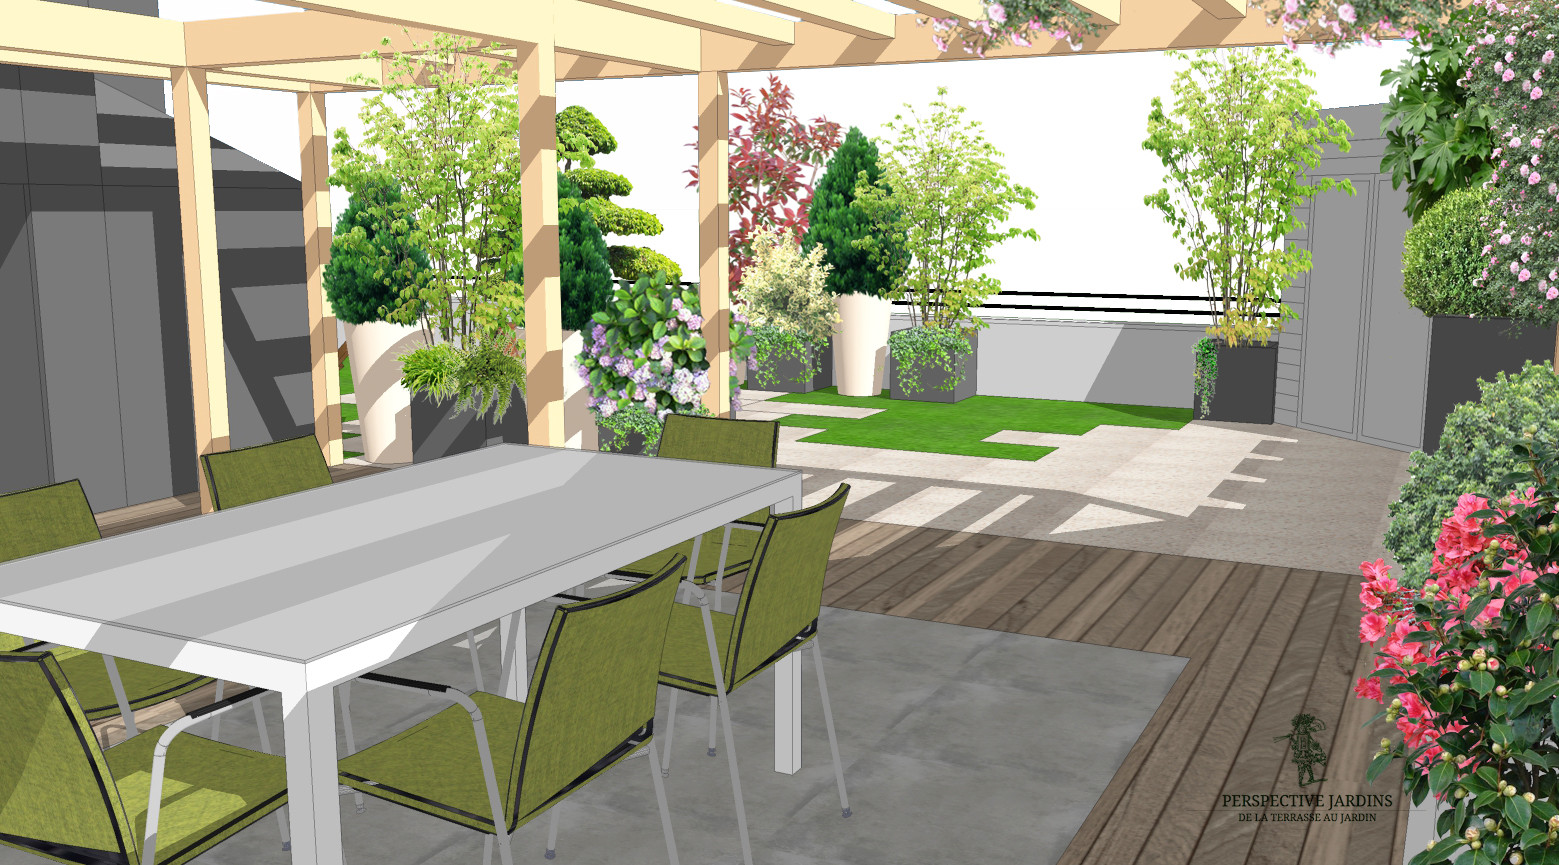 Appartement Terrasse Jardin Yvelines